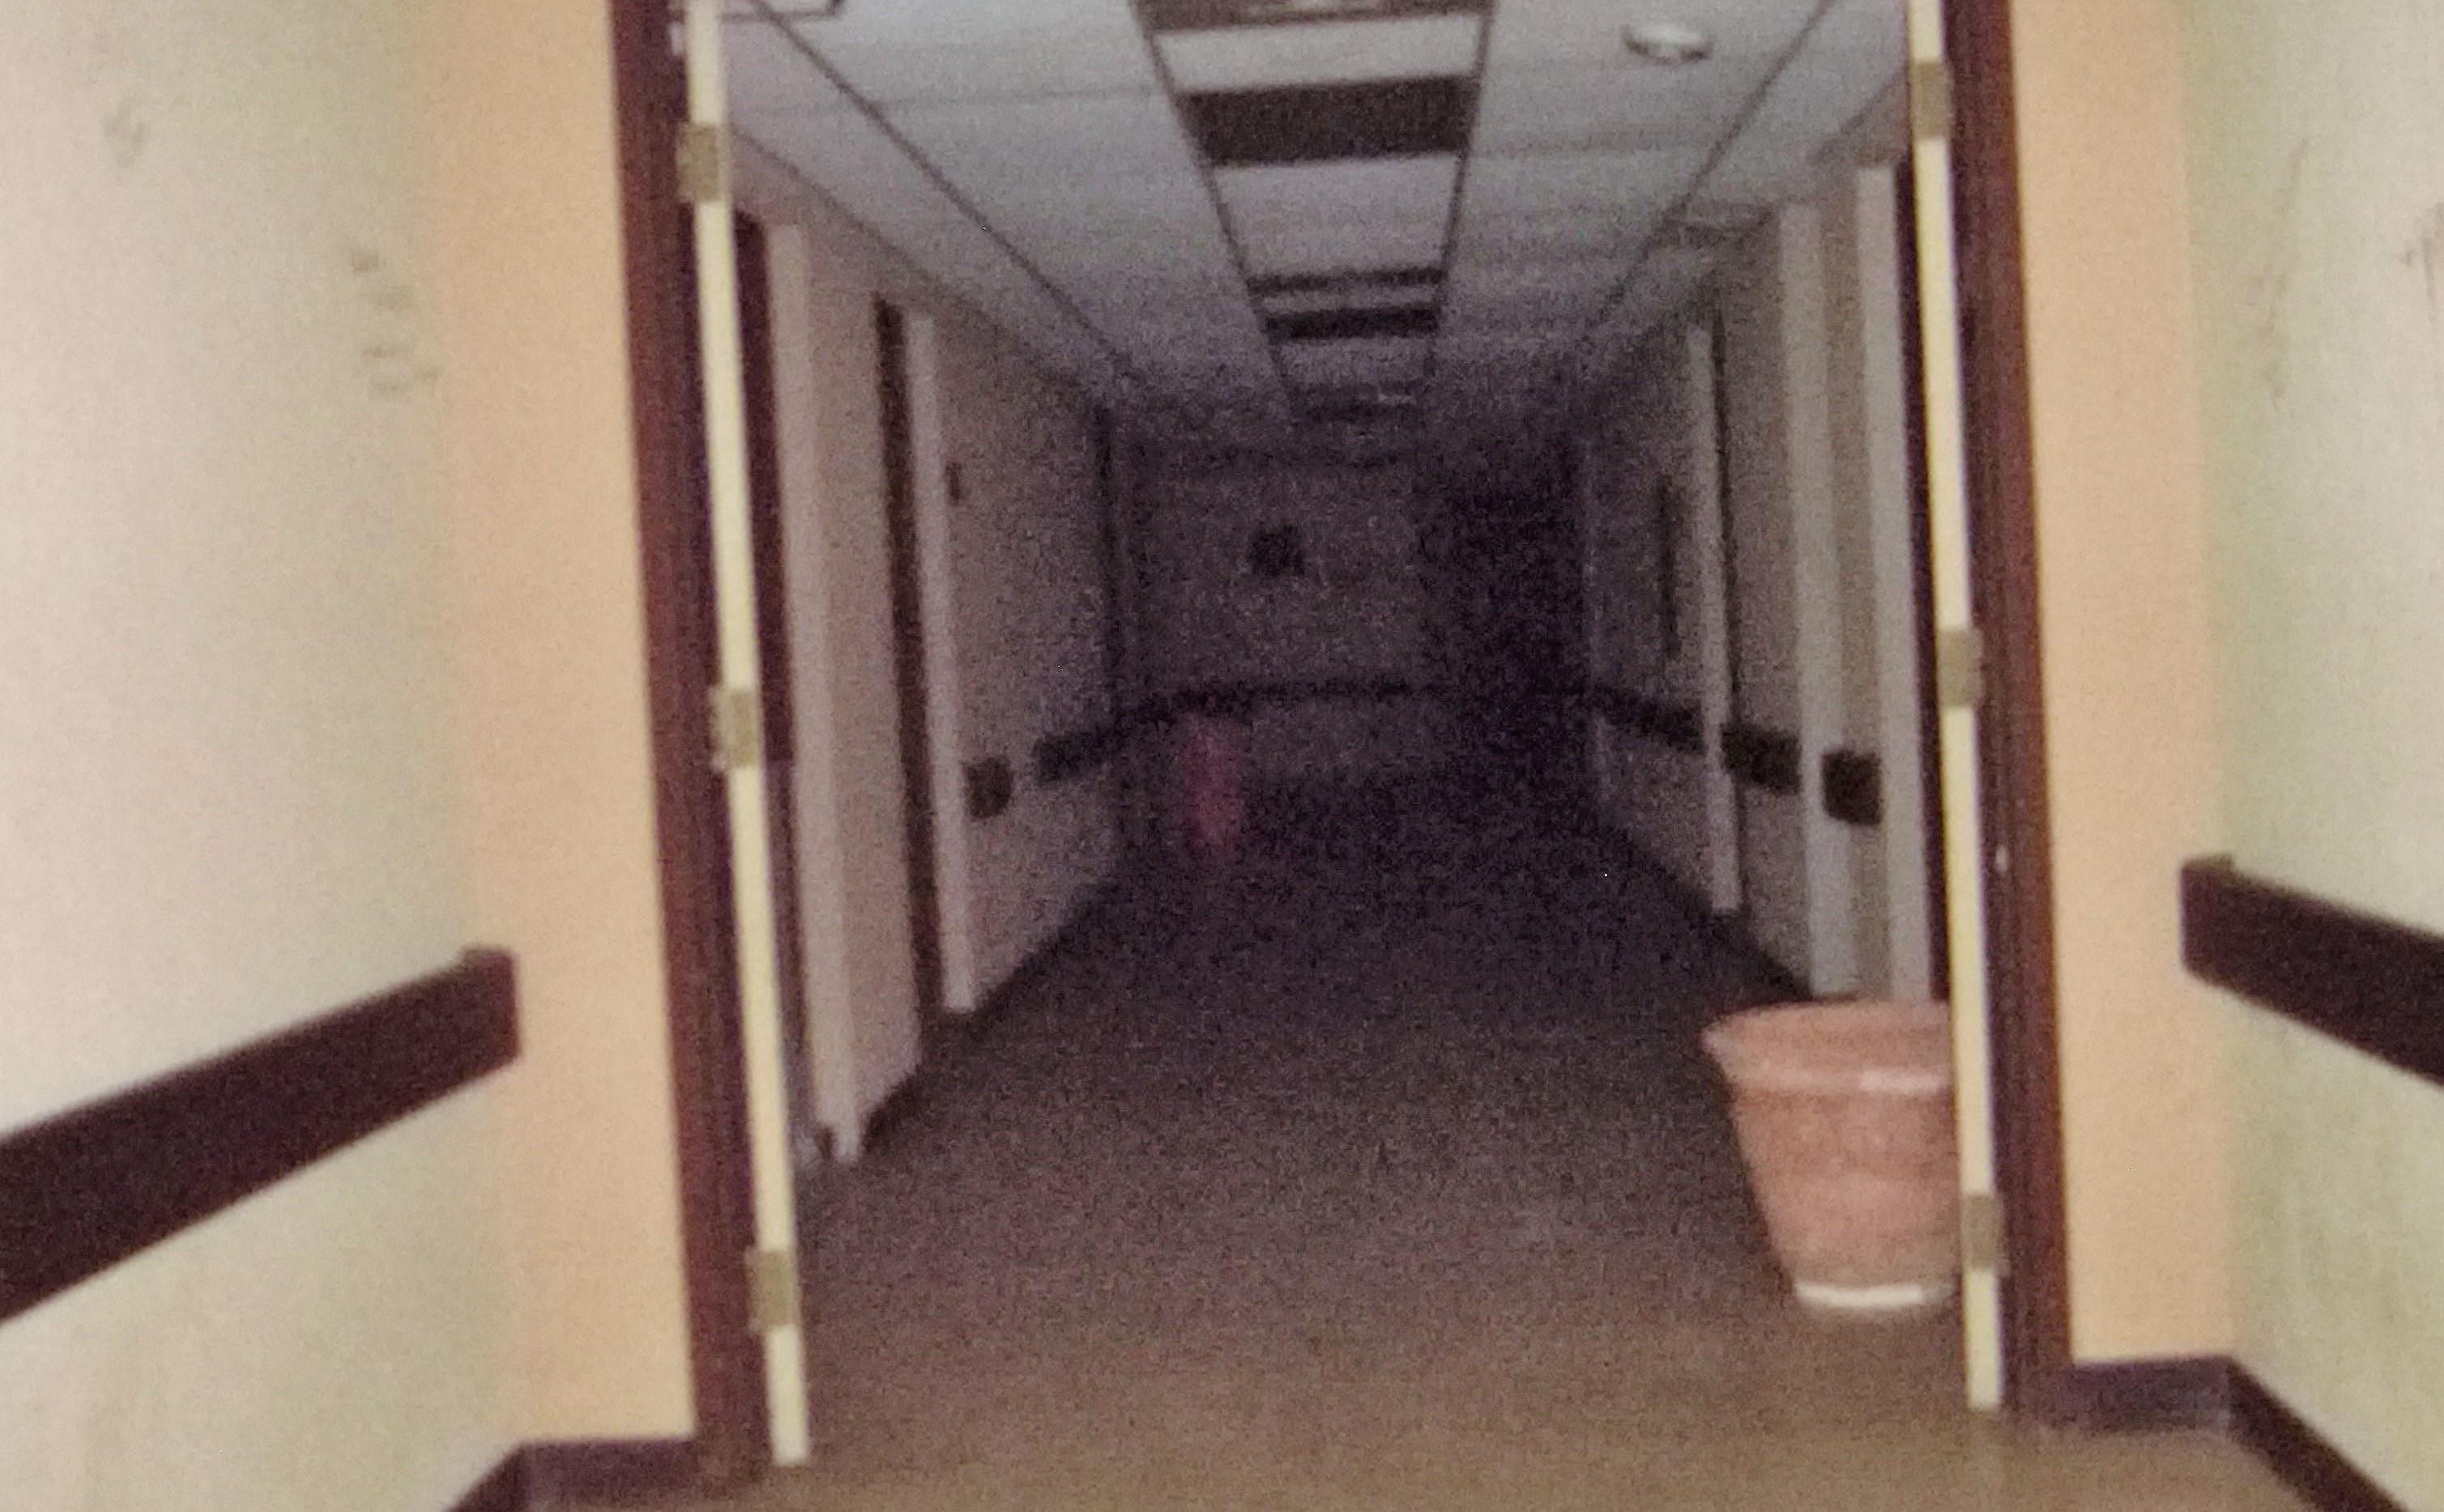 Image in hallway